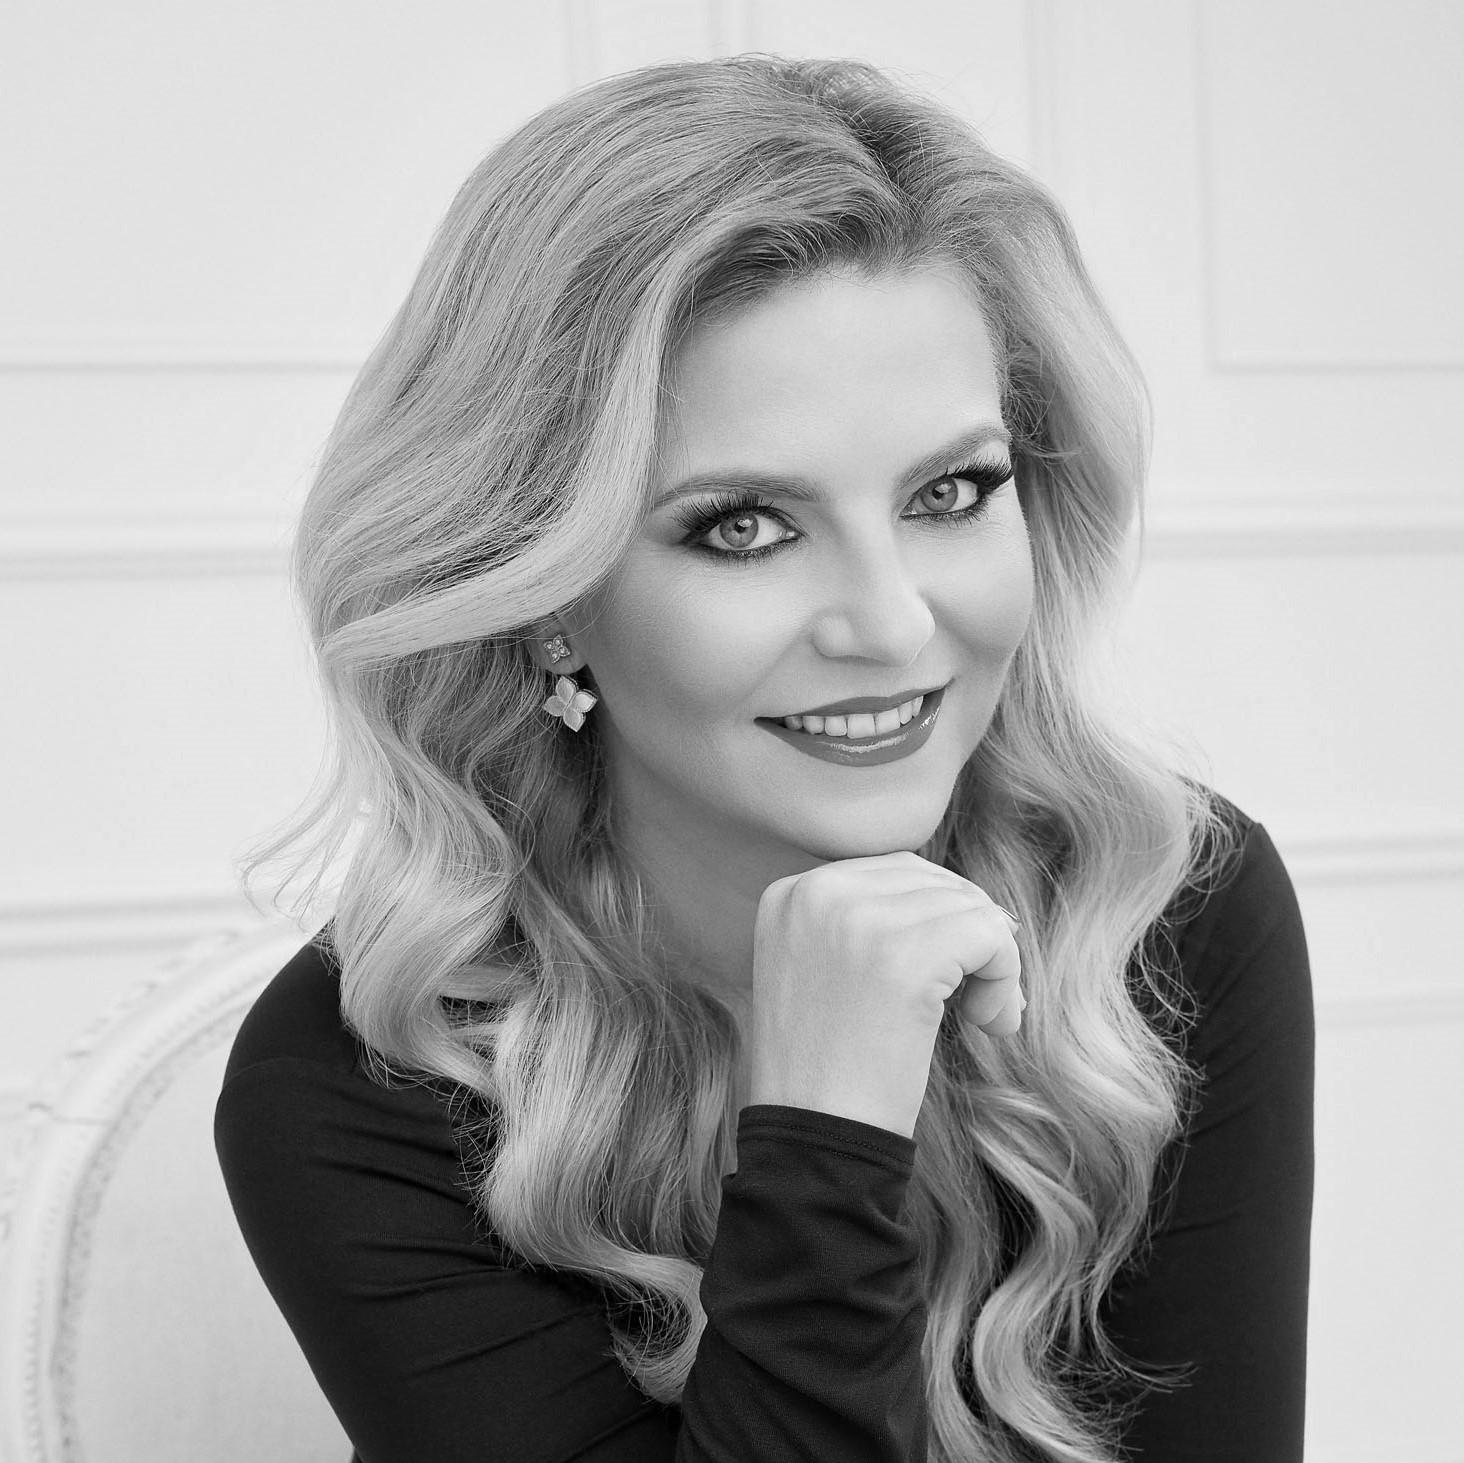 Simona Kijonková